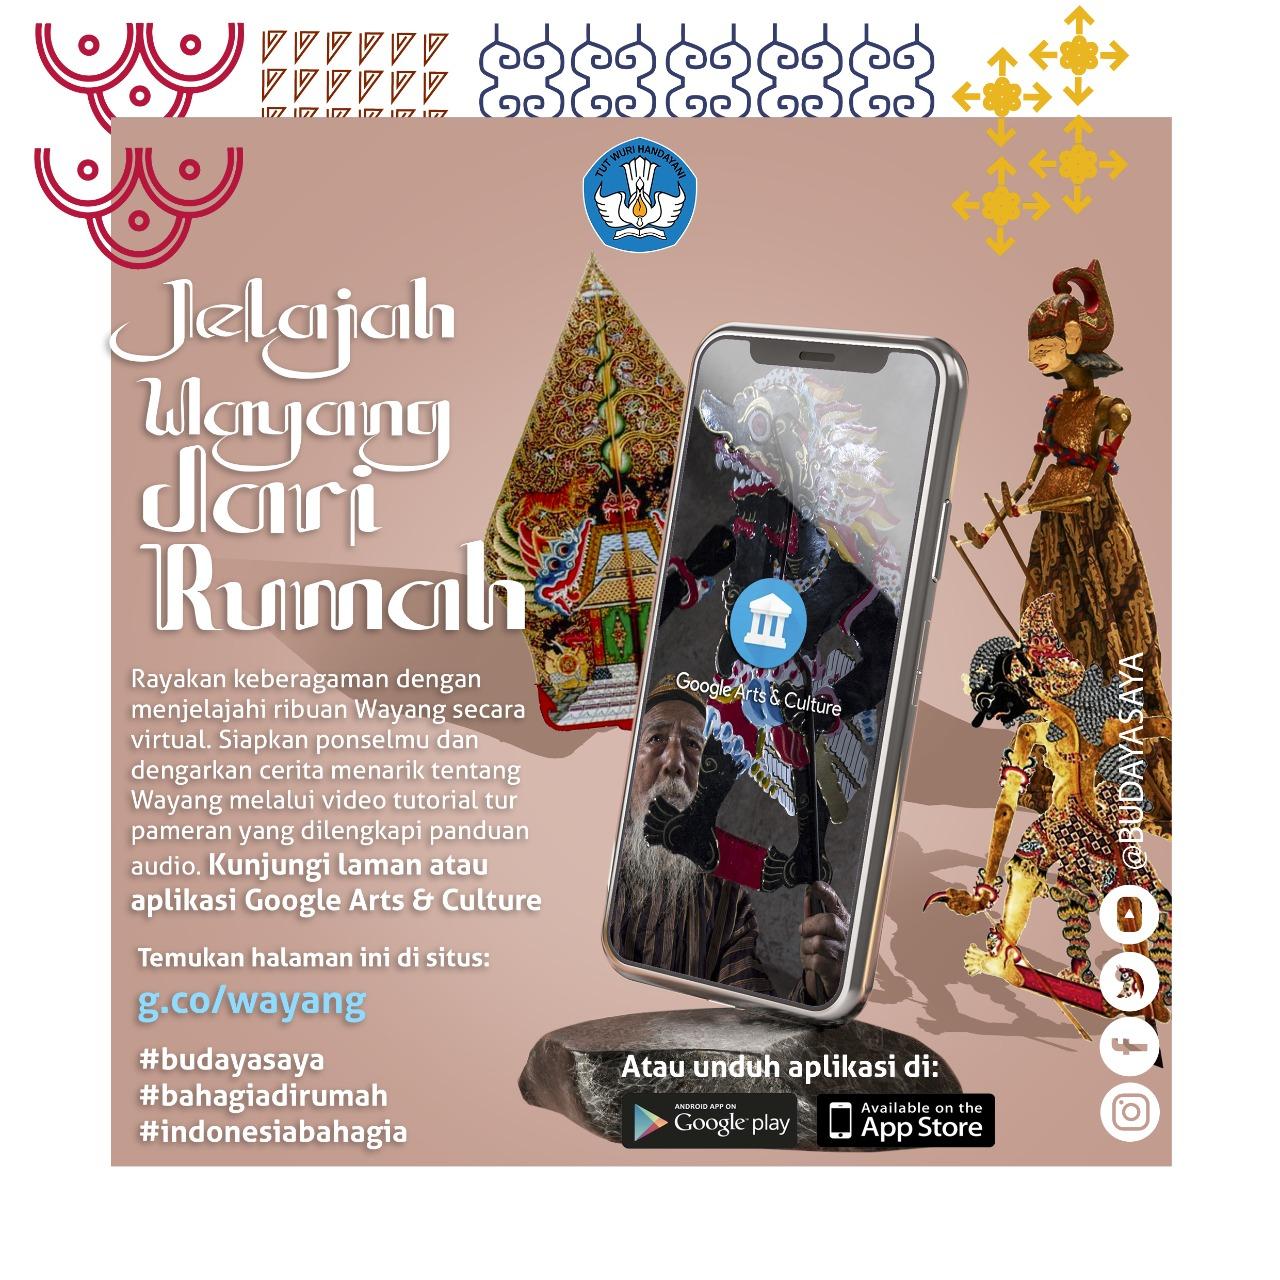 Read more about the article Melestarikan Wayang, Mahakarya Budaya dan Tradisi Indonesia, Secara Digital